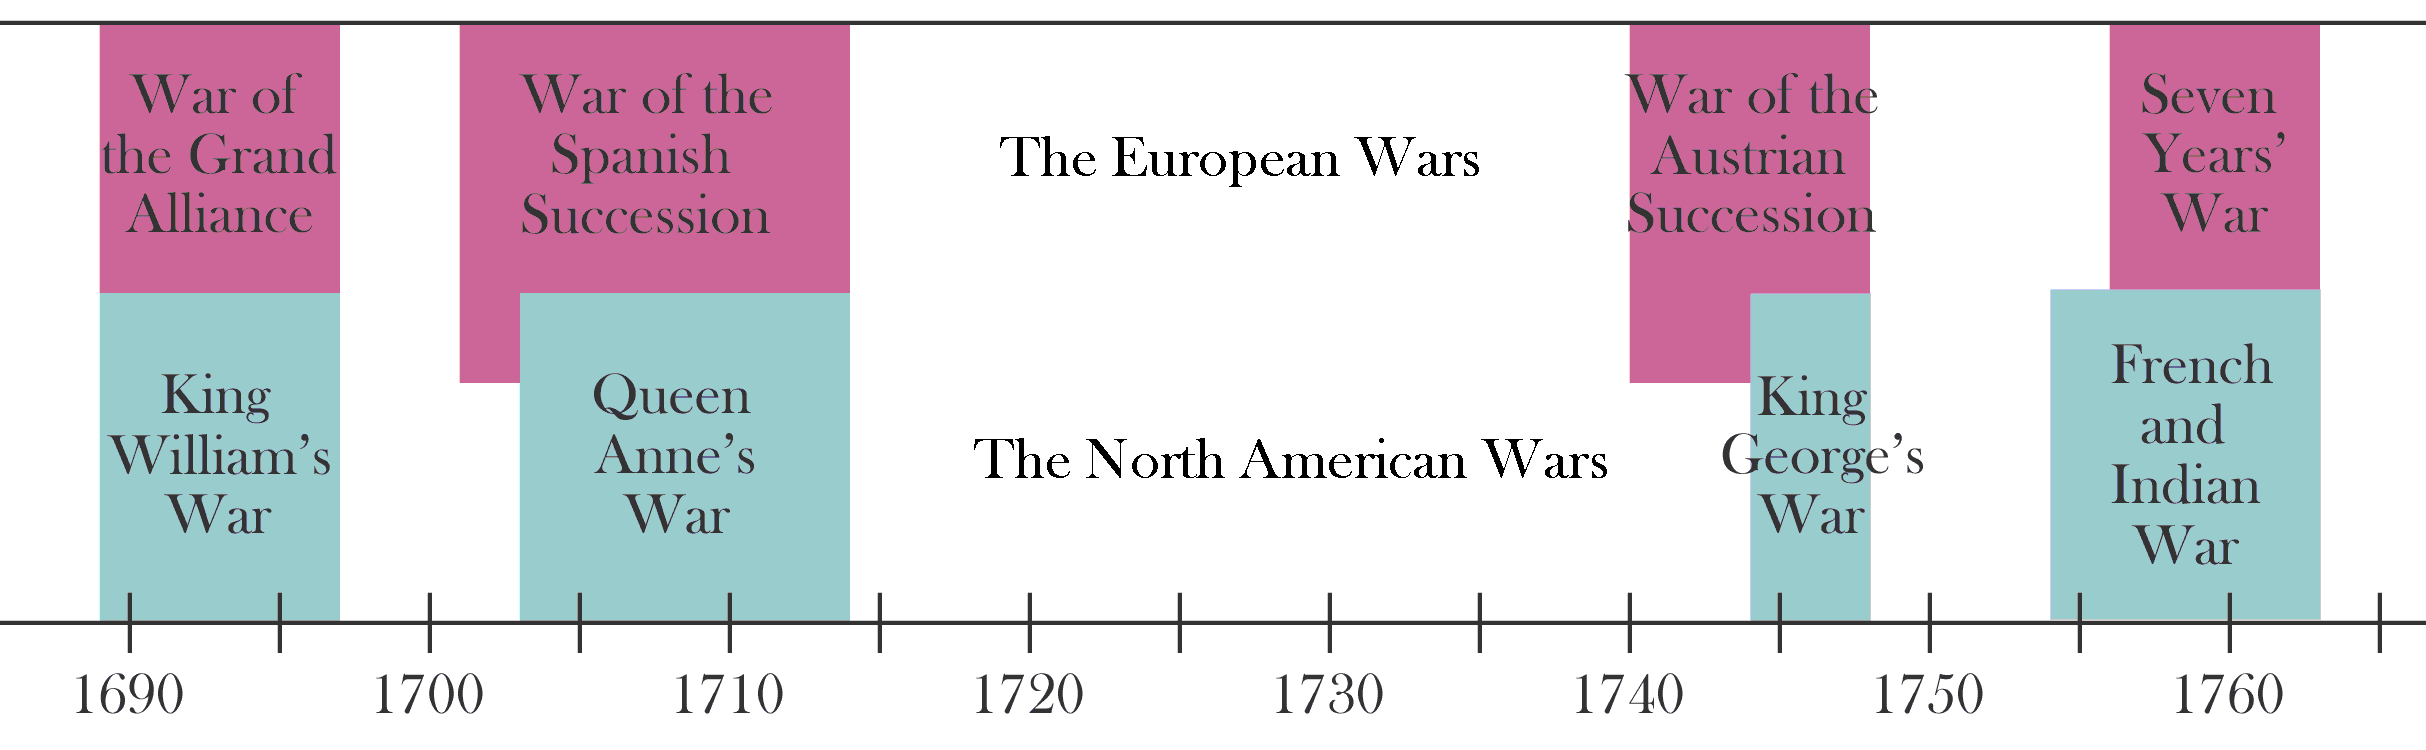 Imperial_Wars_timeline